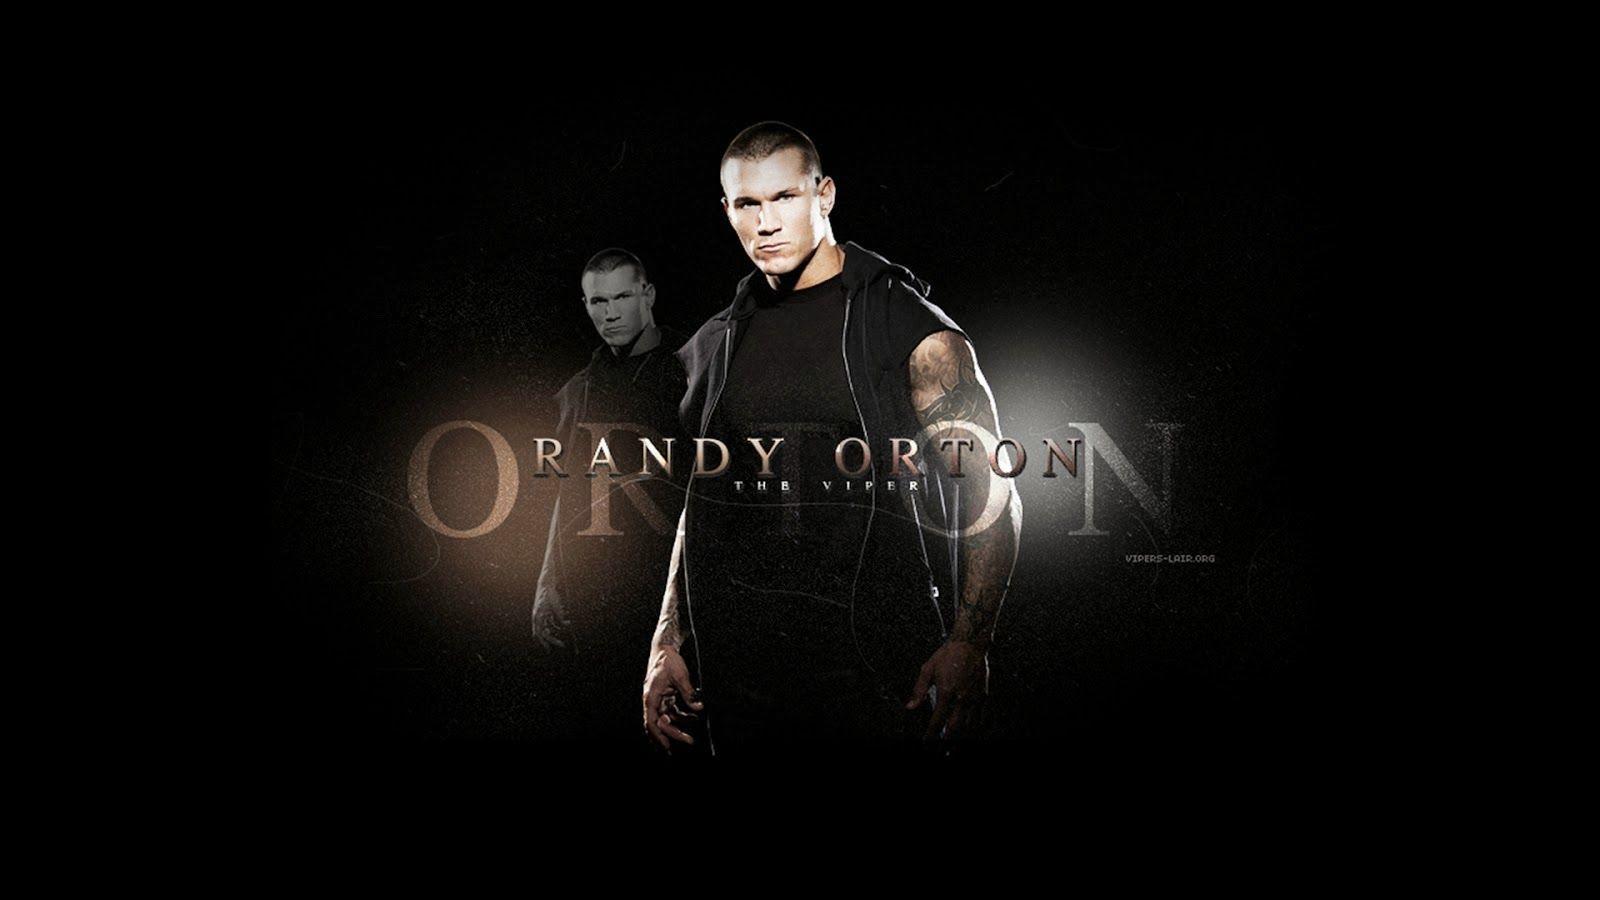 Randy Orton Wallpaper 2014 11634 | ZBSOURCE